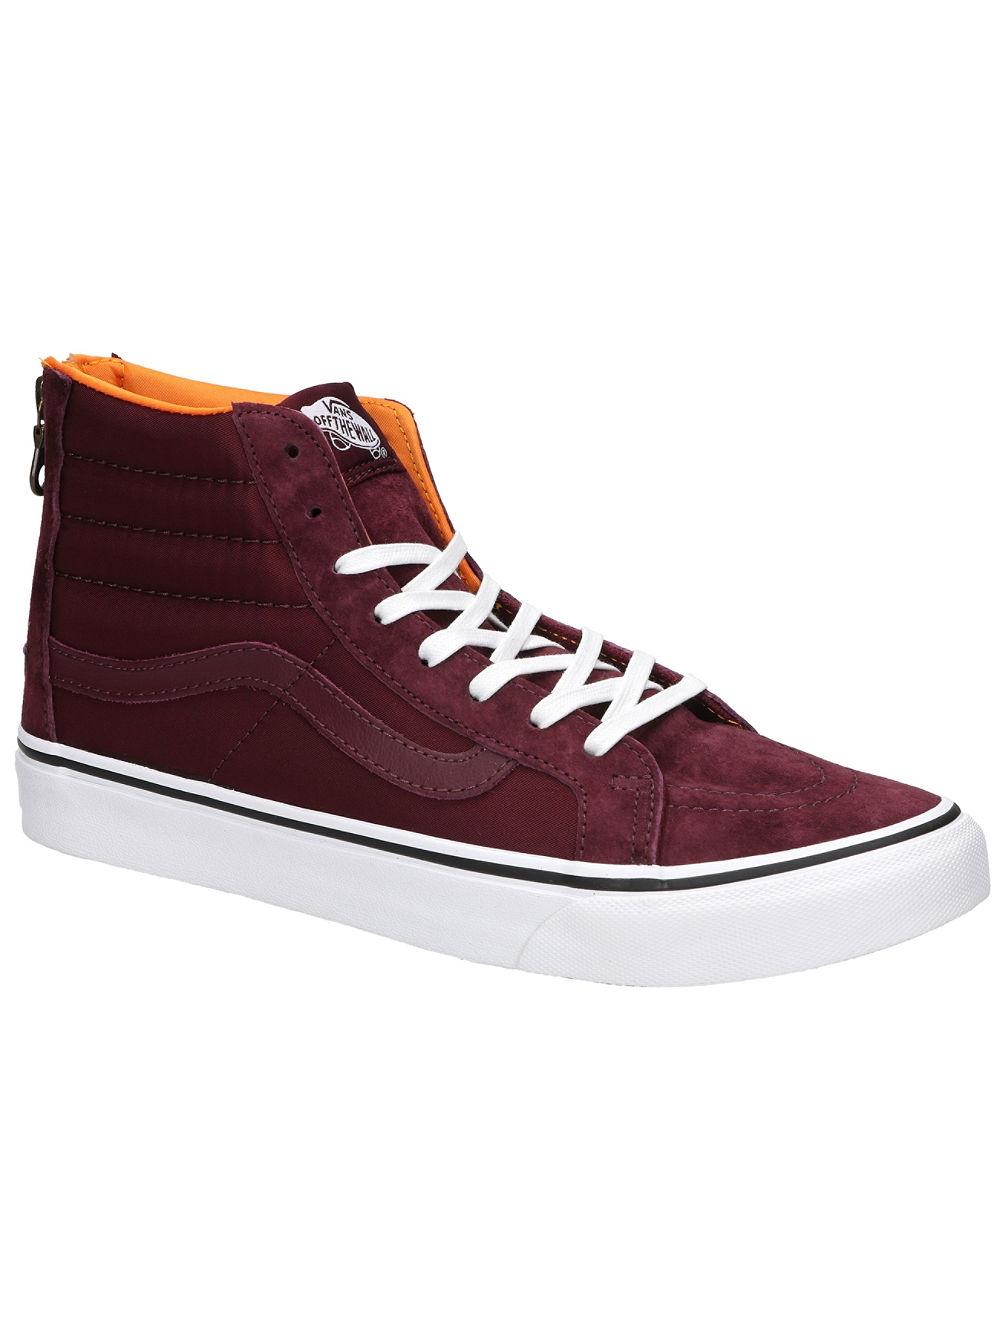 Buy Vans Sk8-Hi Slim Zip Sneakers online at blue-tomato.com 41e50a4c51